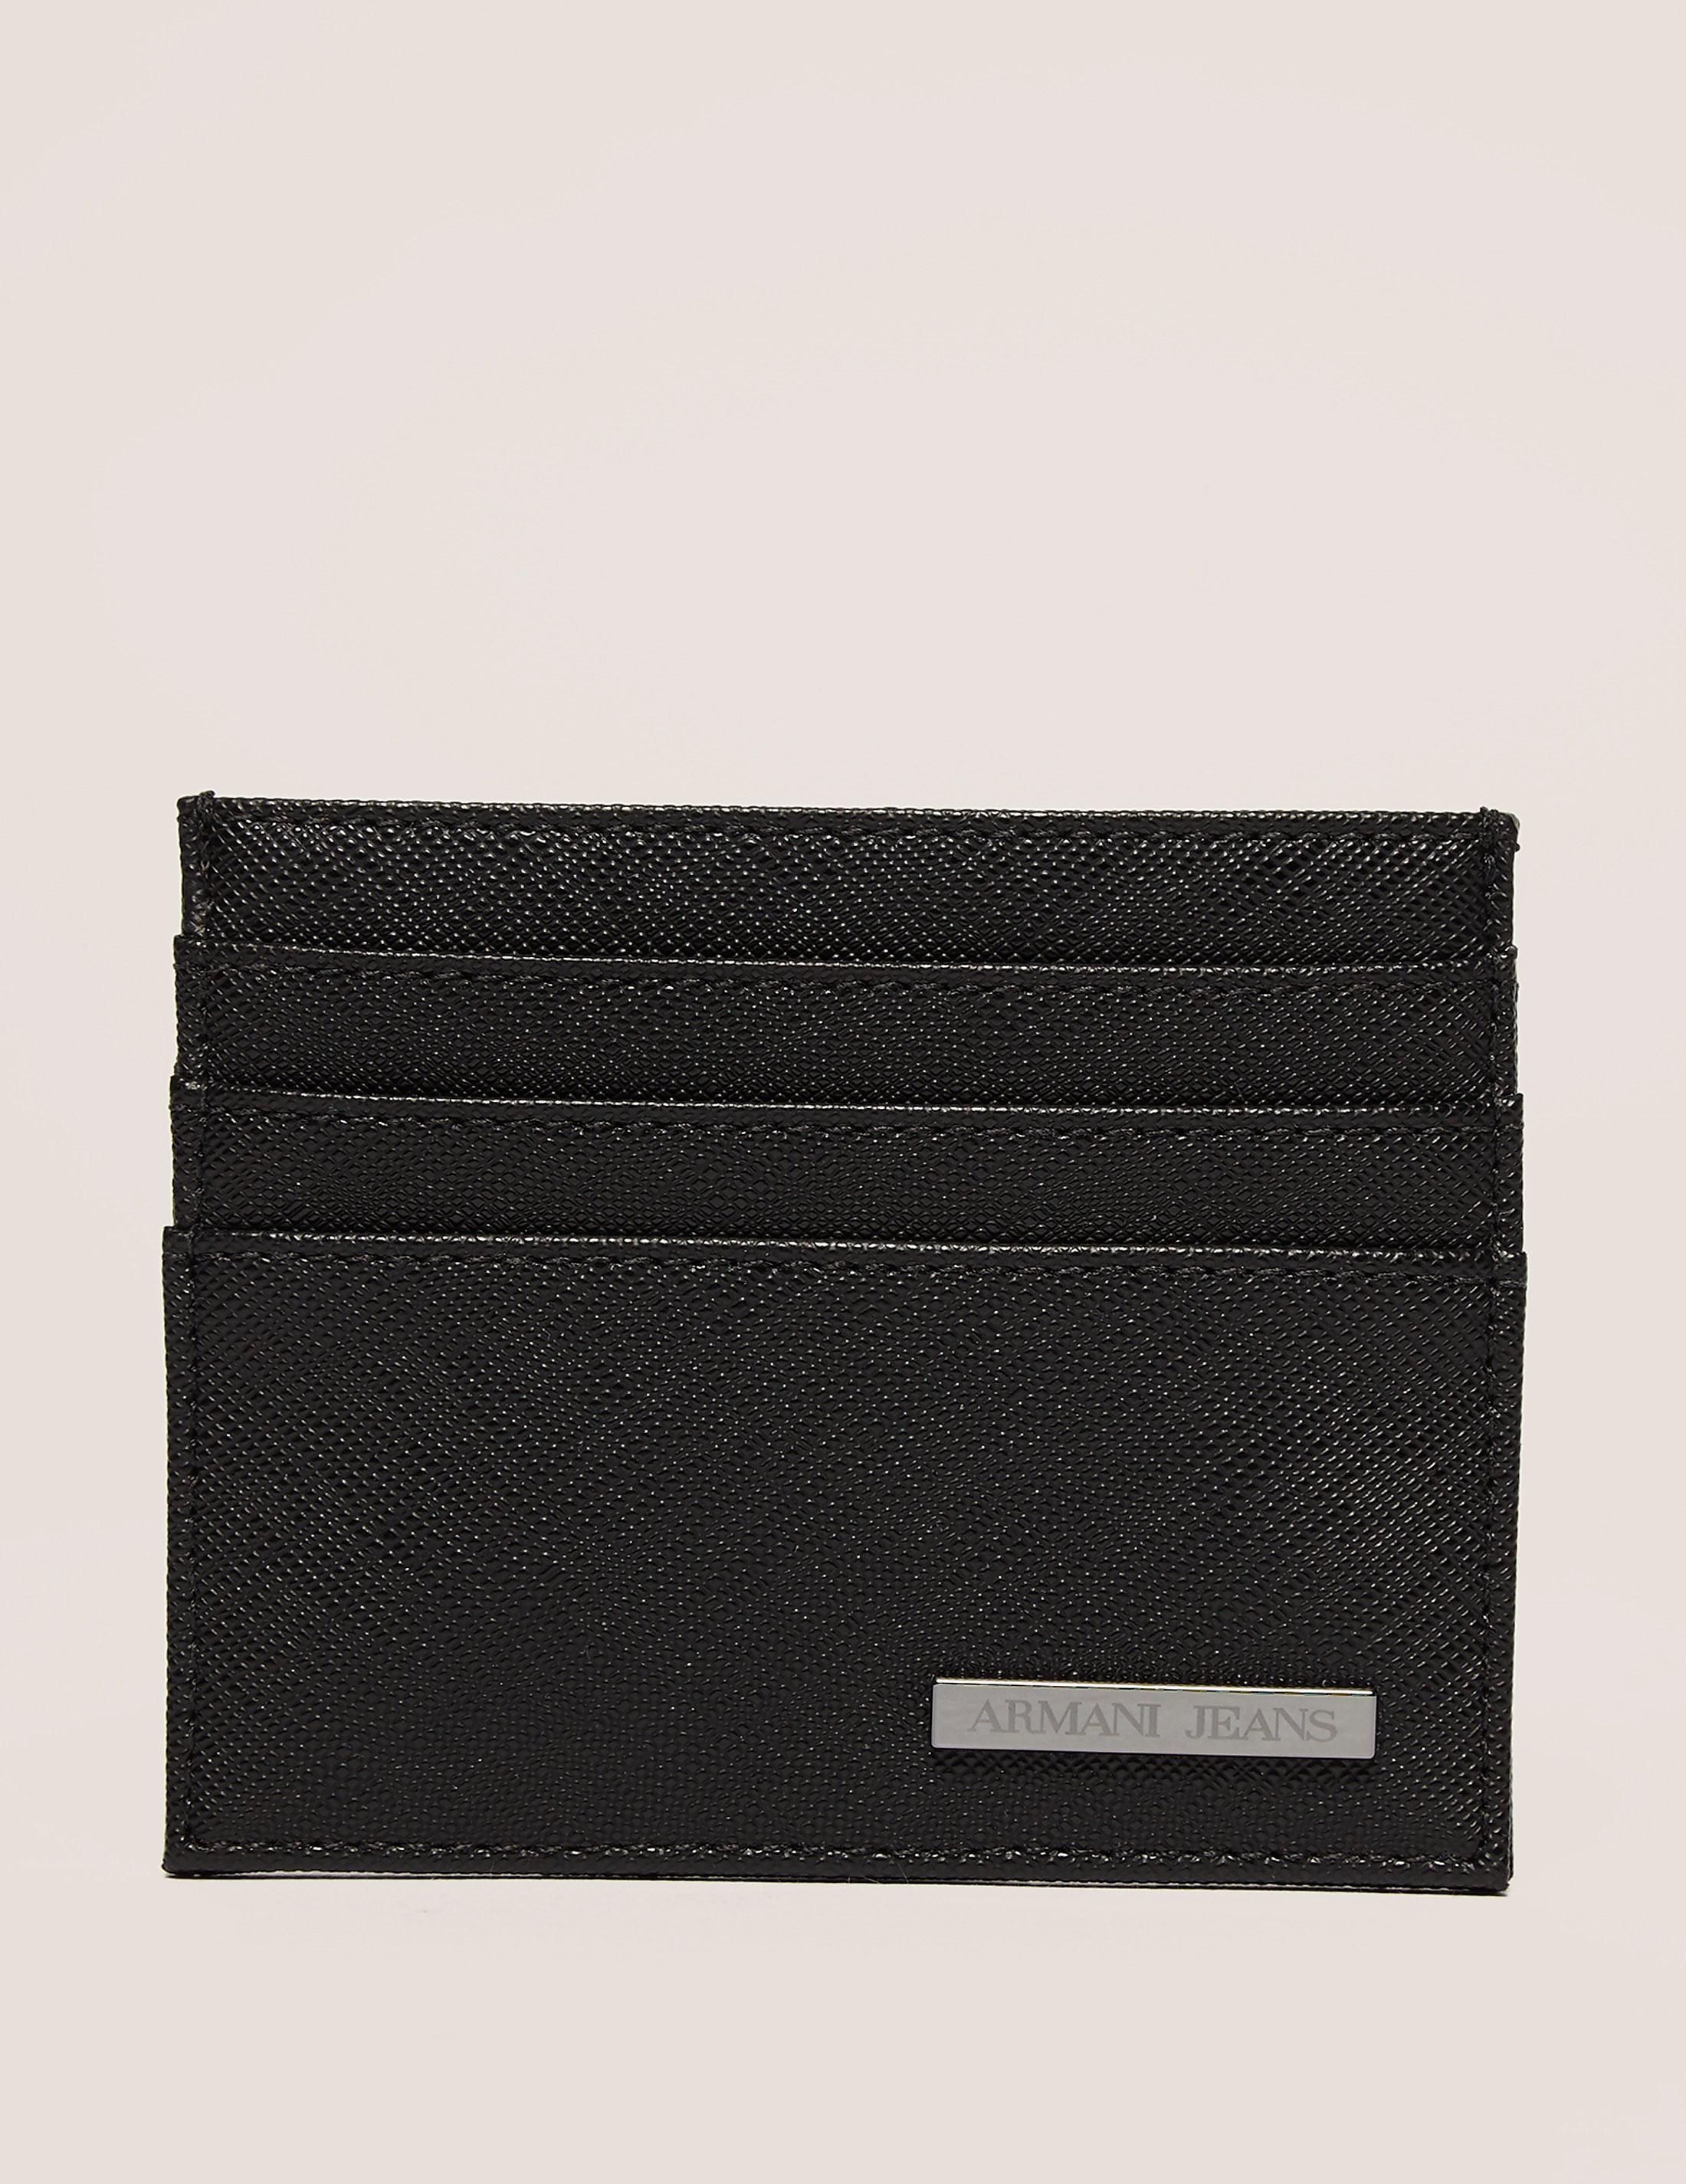 Armani Jeans Saffiano Card Holder